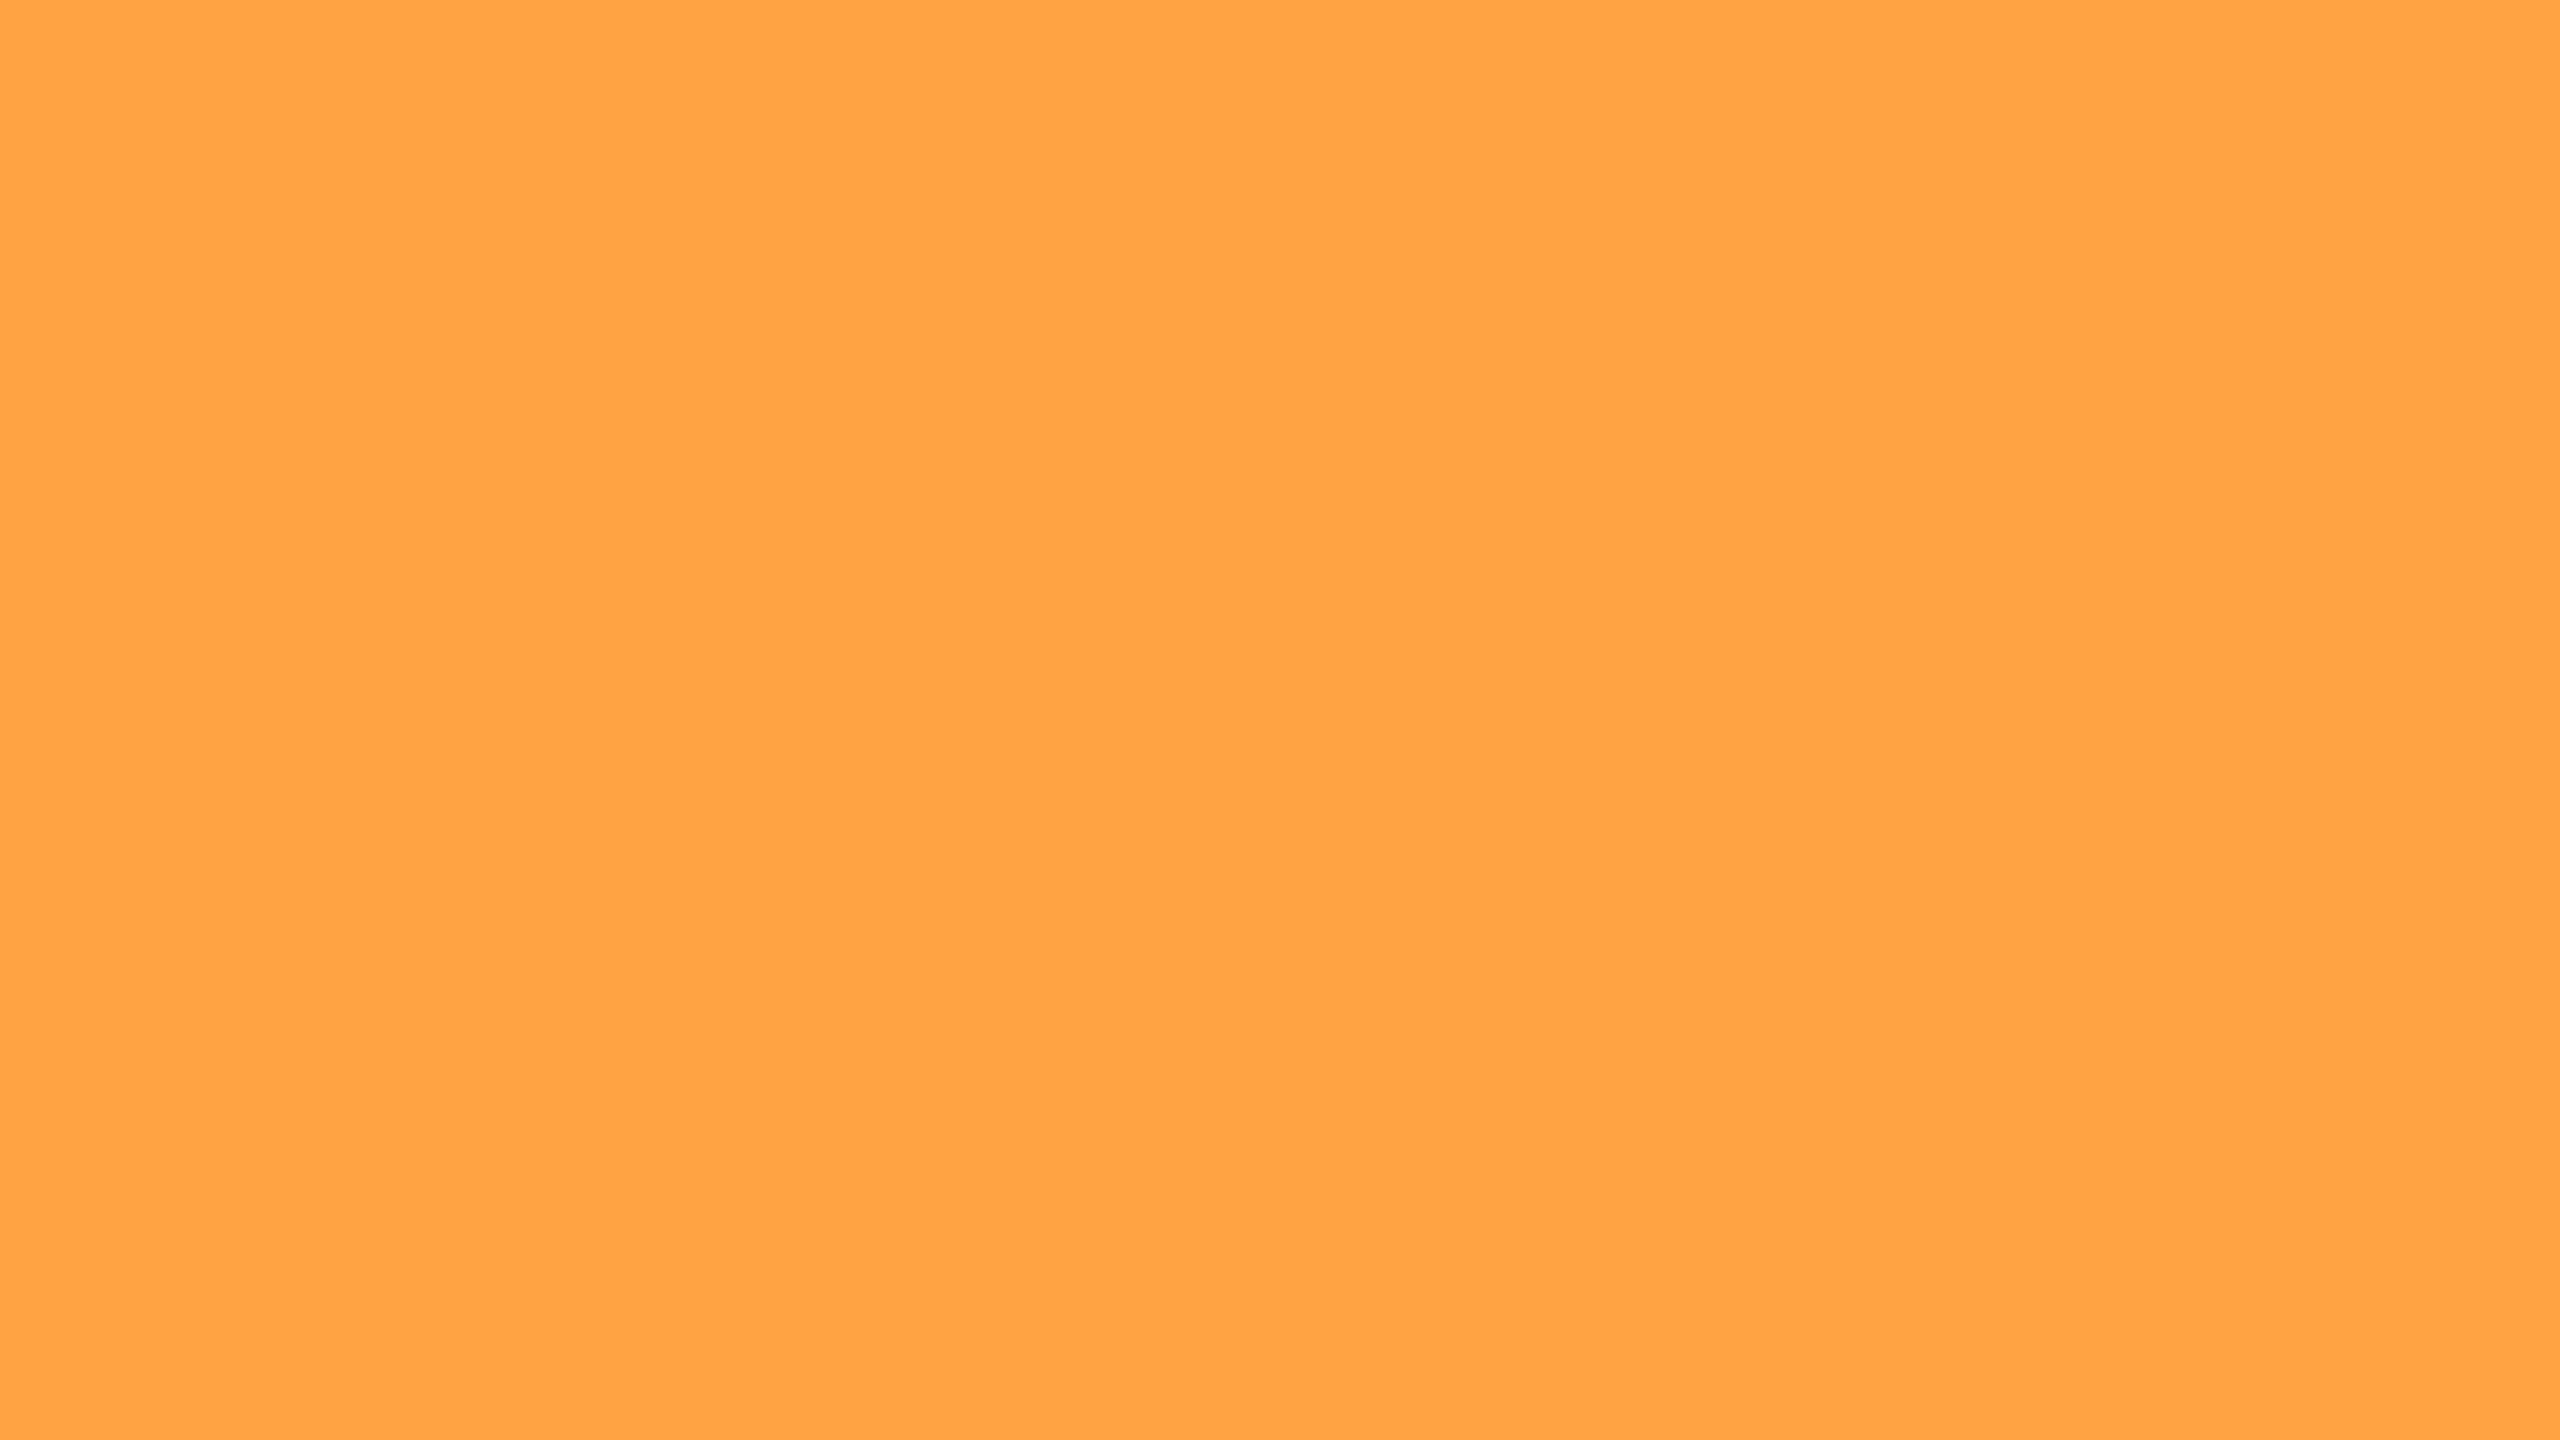 plain light orange background wwwpixsharkcom images